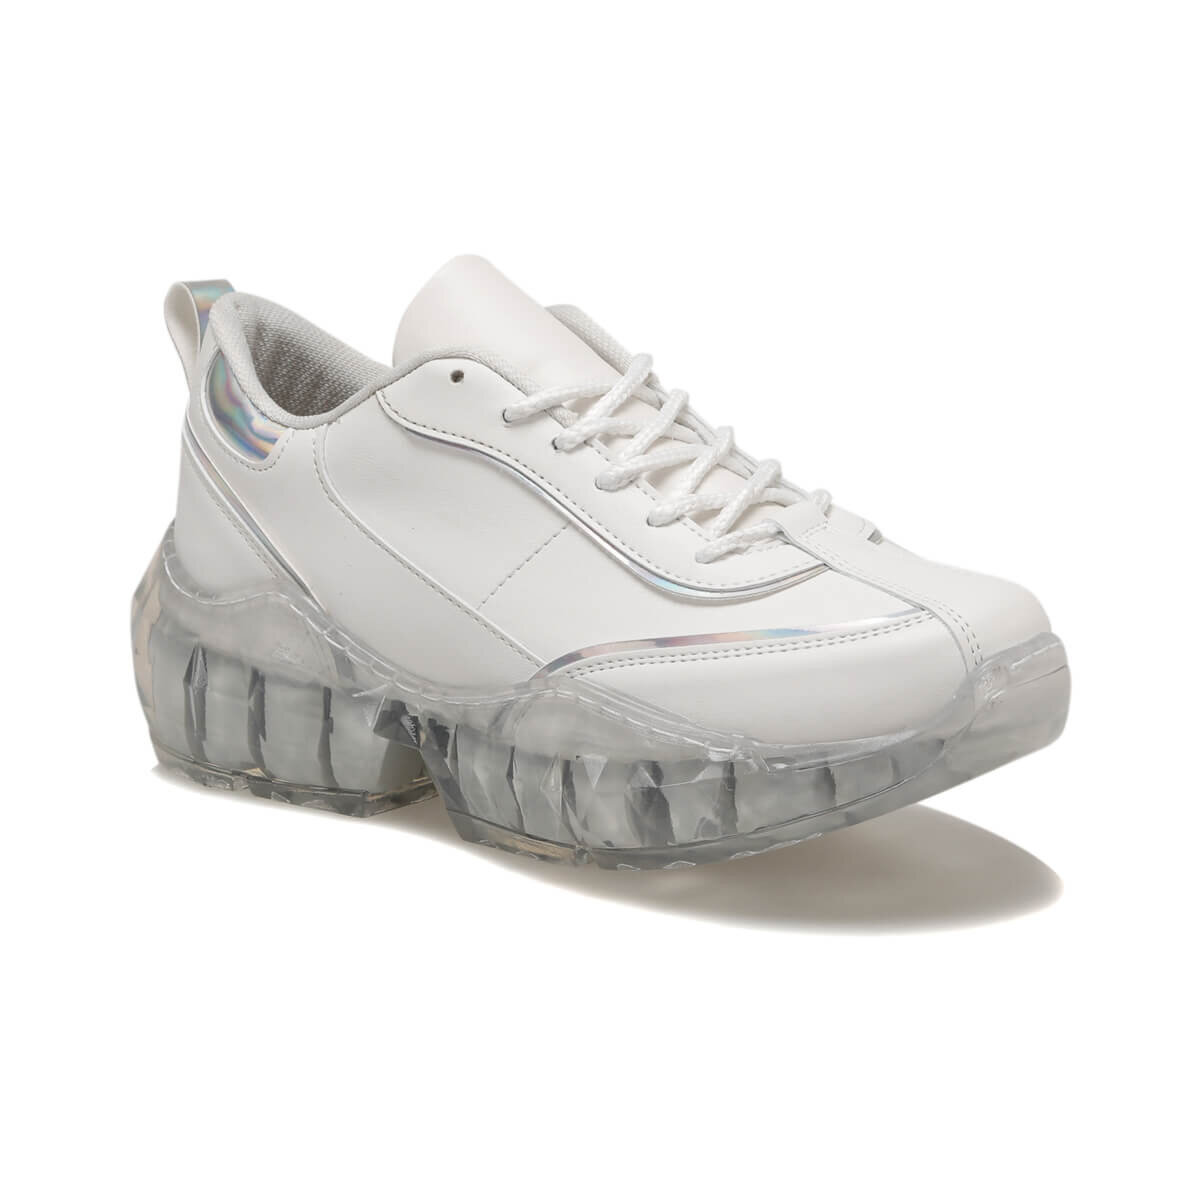 FLO 19K-958 White Women 'S Sneaker BUTIGO